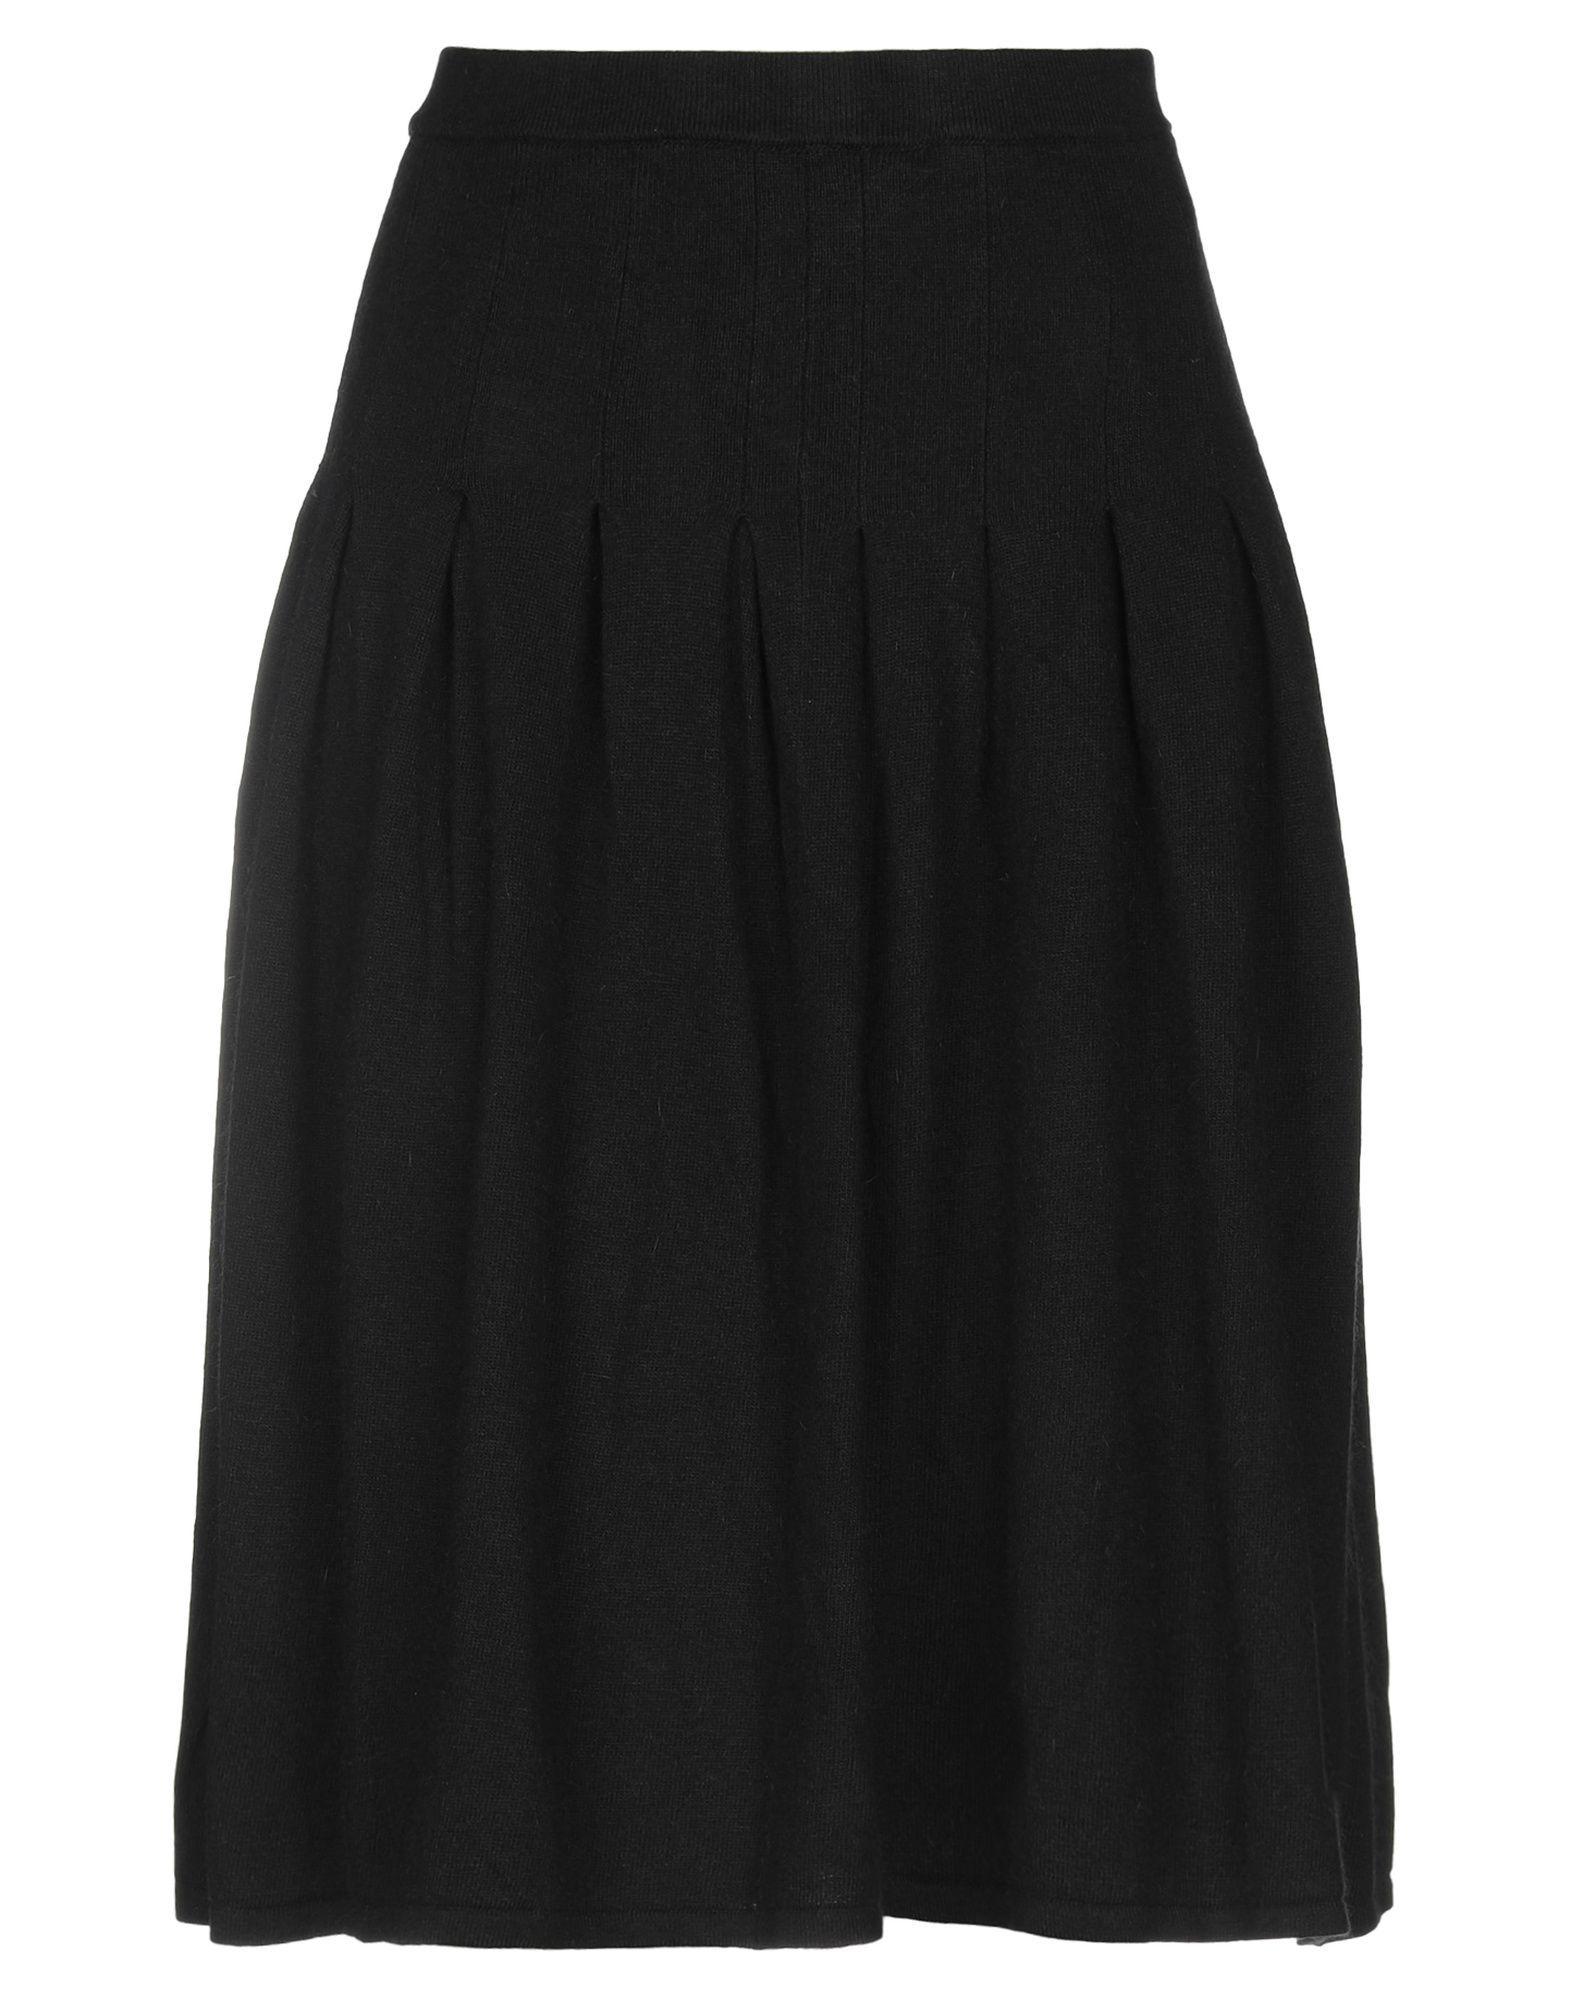 Pierre Balmain Black Knit Skirt